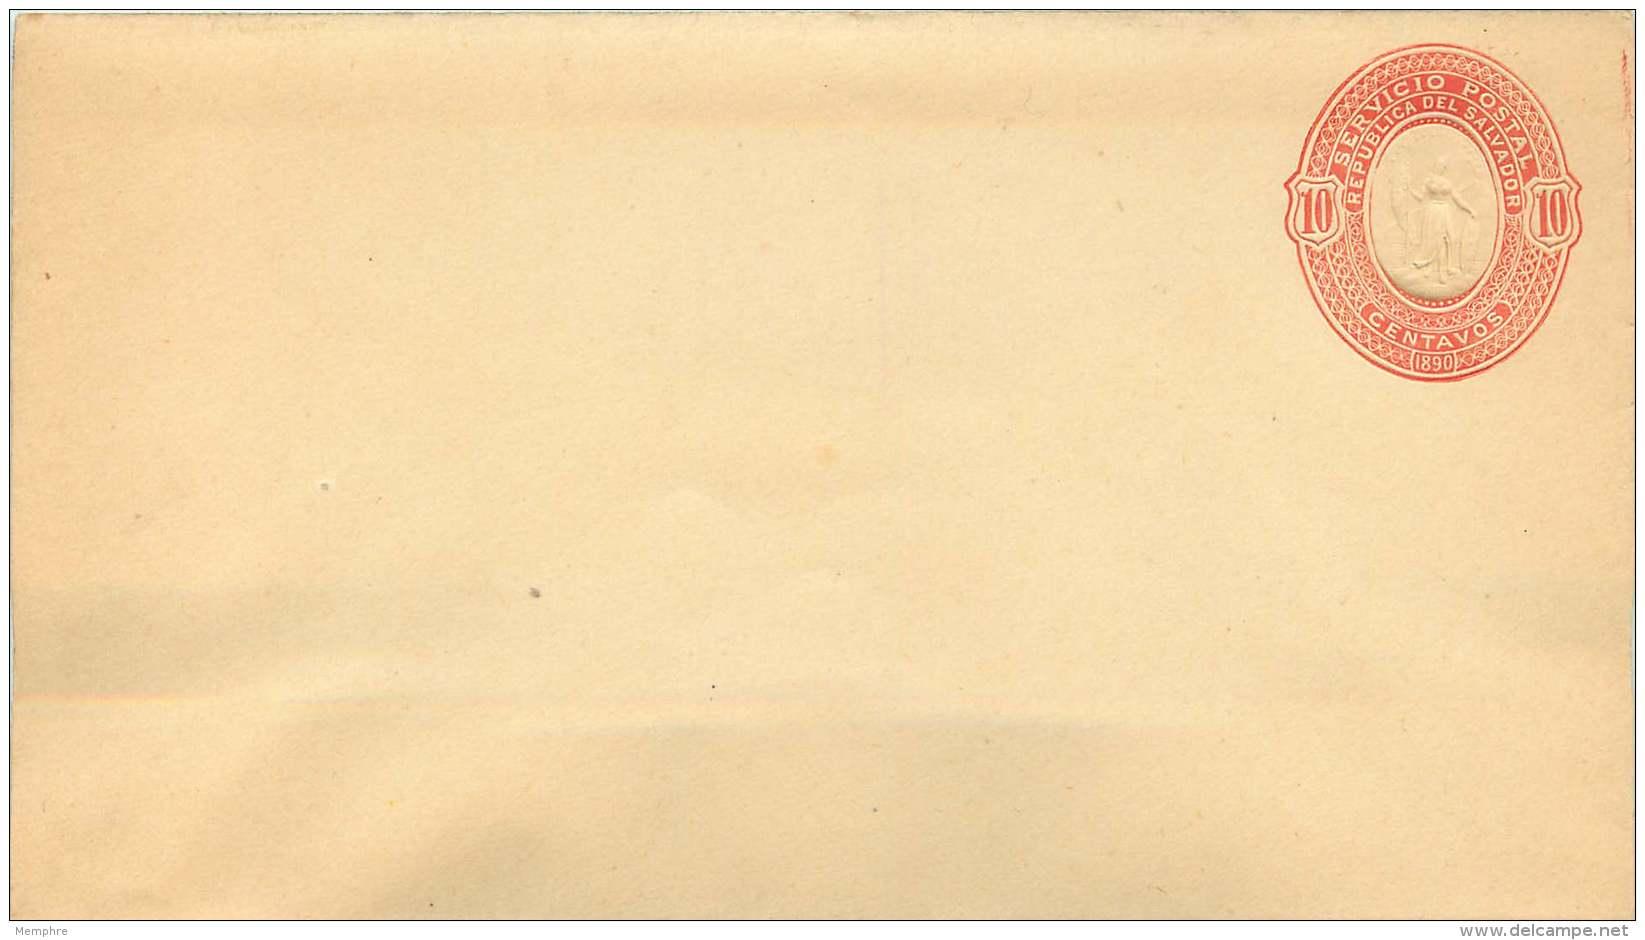 El Salvador  Postal Stationery   1890  10 Cent  - On Light Yellow  Wove - El Salvador